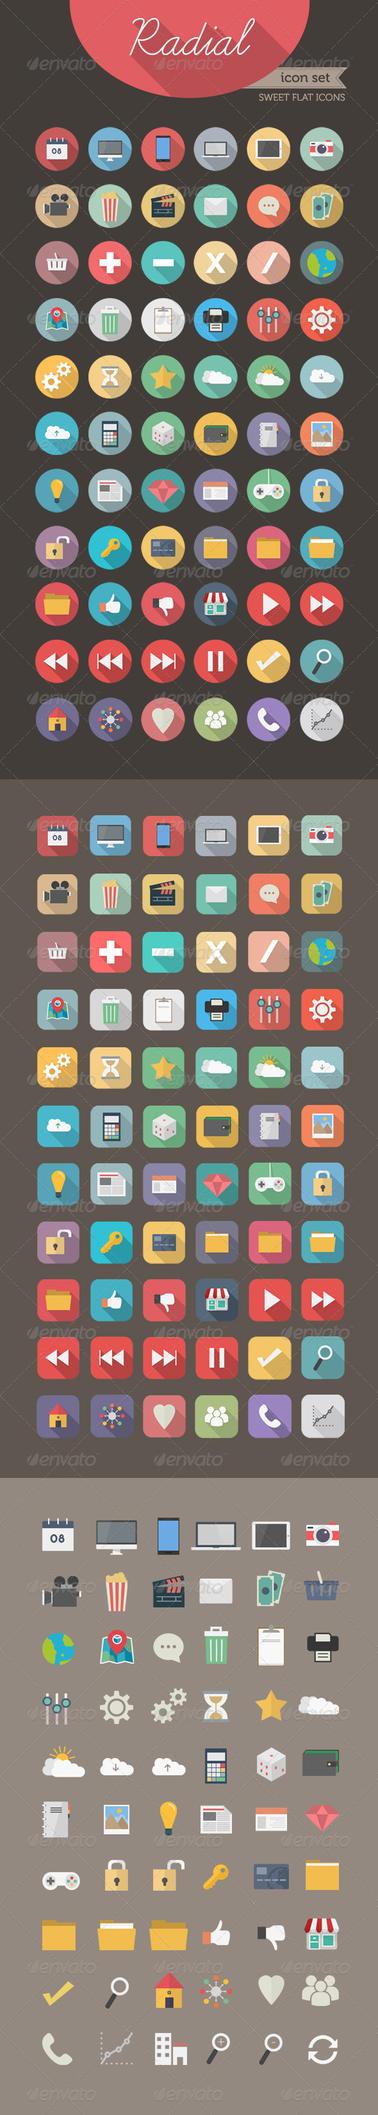 Radial Icon set 3 - Sweet Flat Icons by Softboxindia